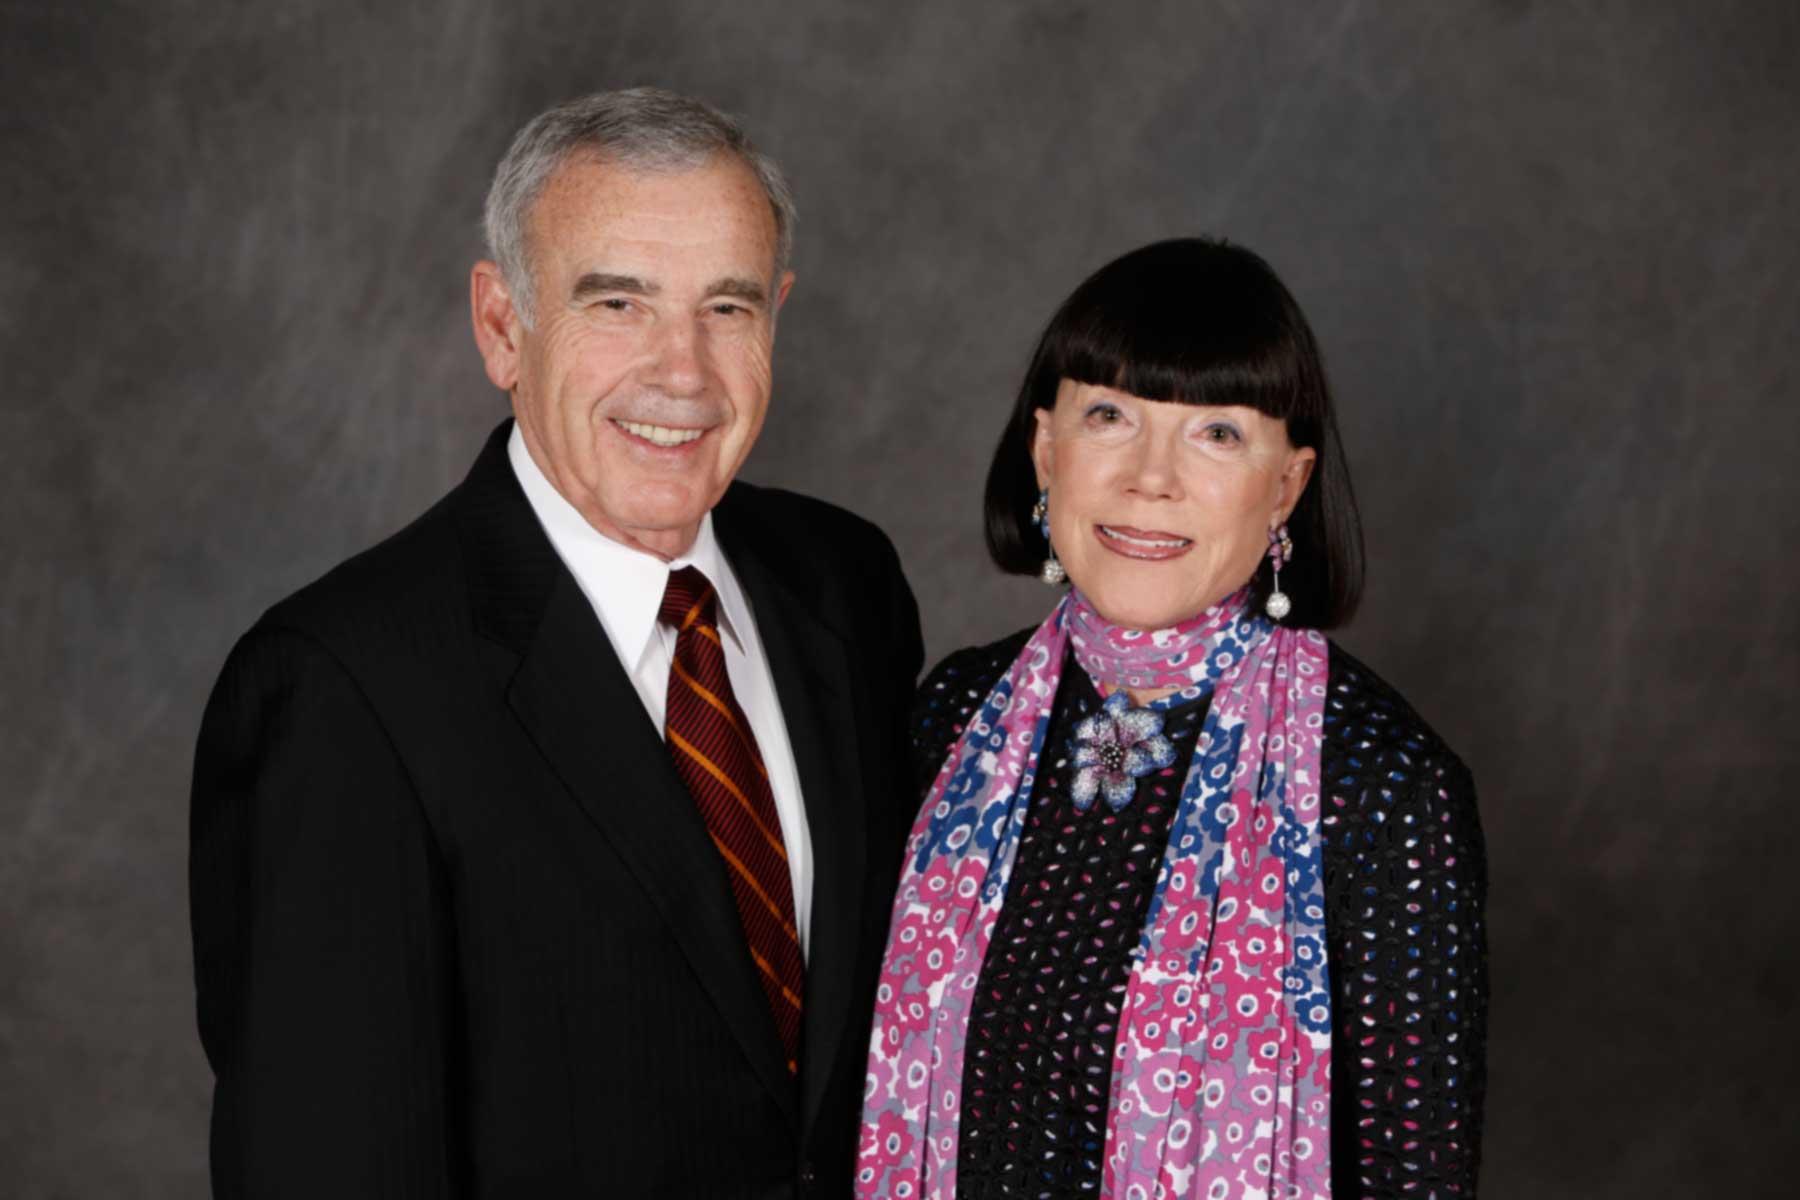 Edward and Gayle Roski